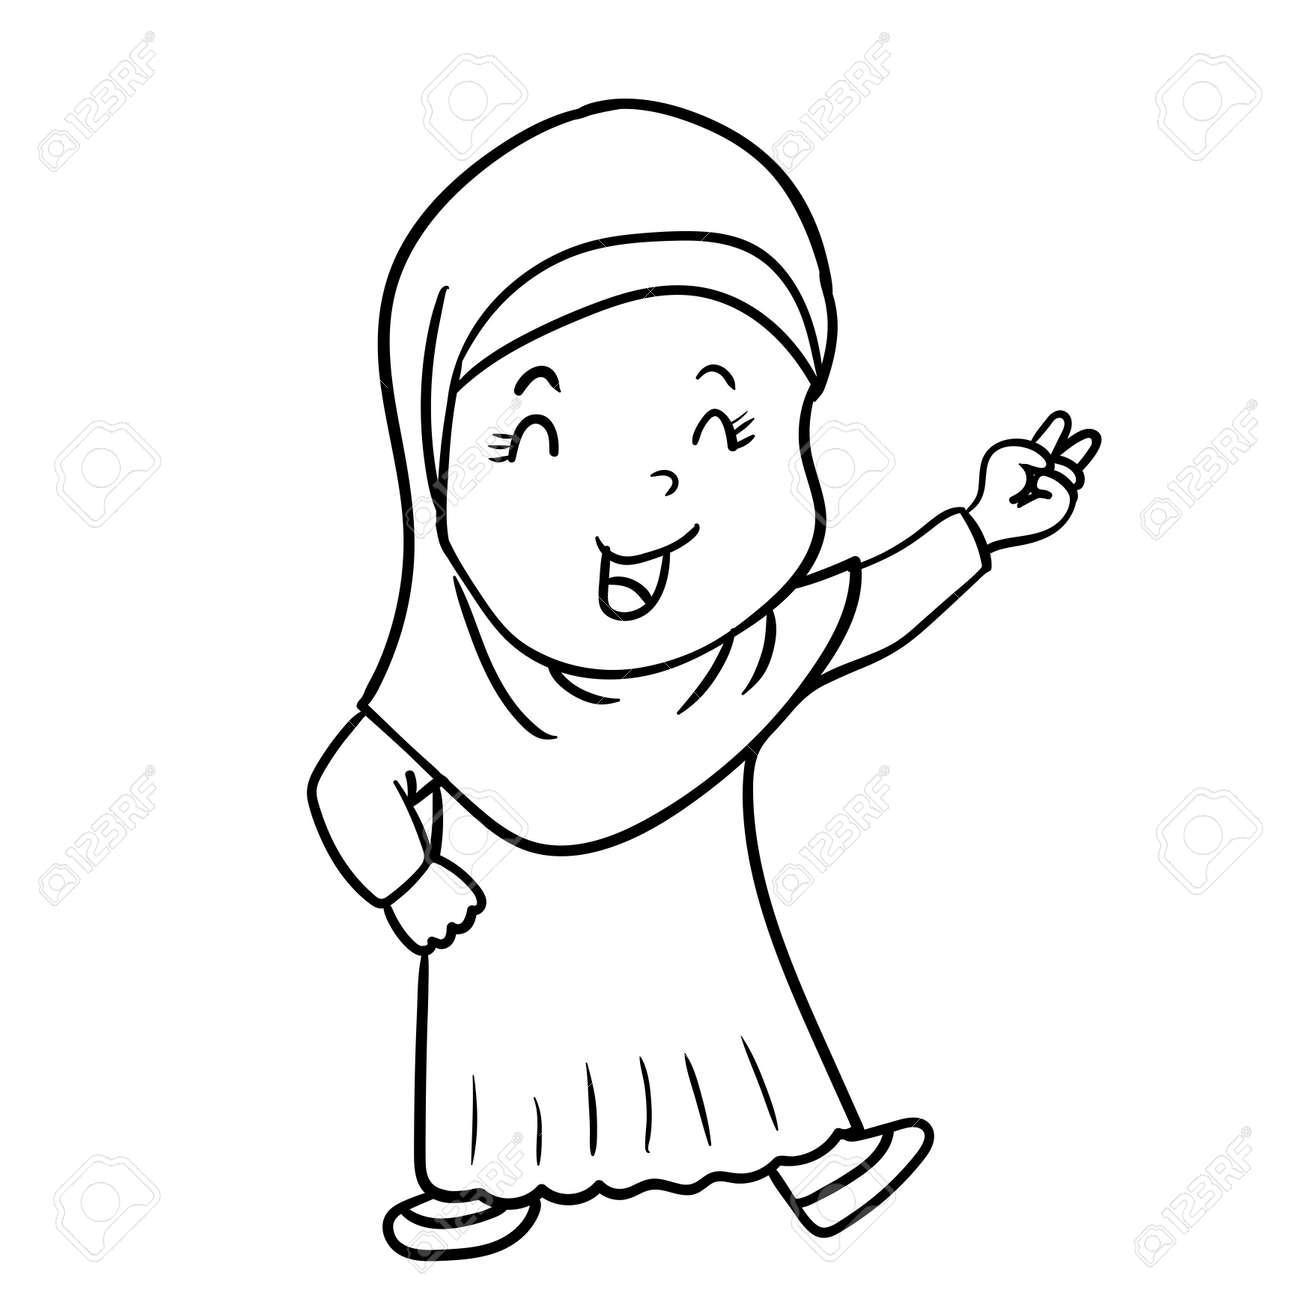 Dessin Dessin Anime Fille Musulmane Avec Signe De La Victoire Isole